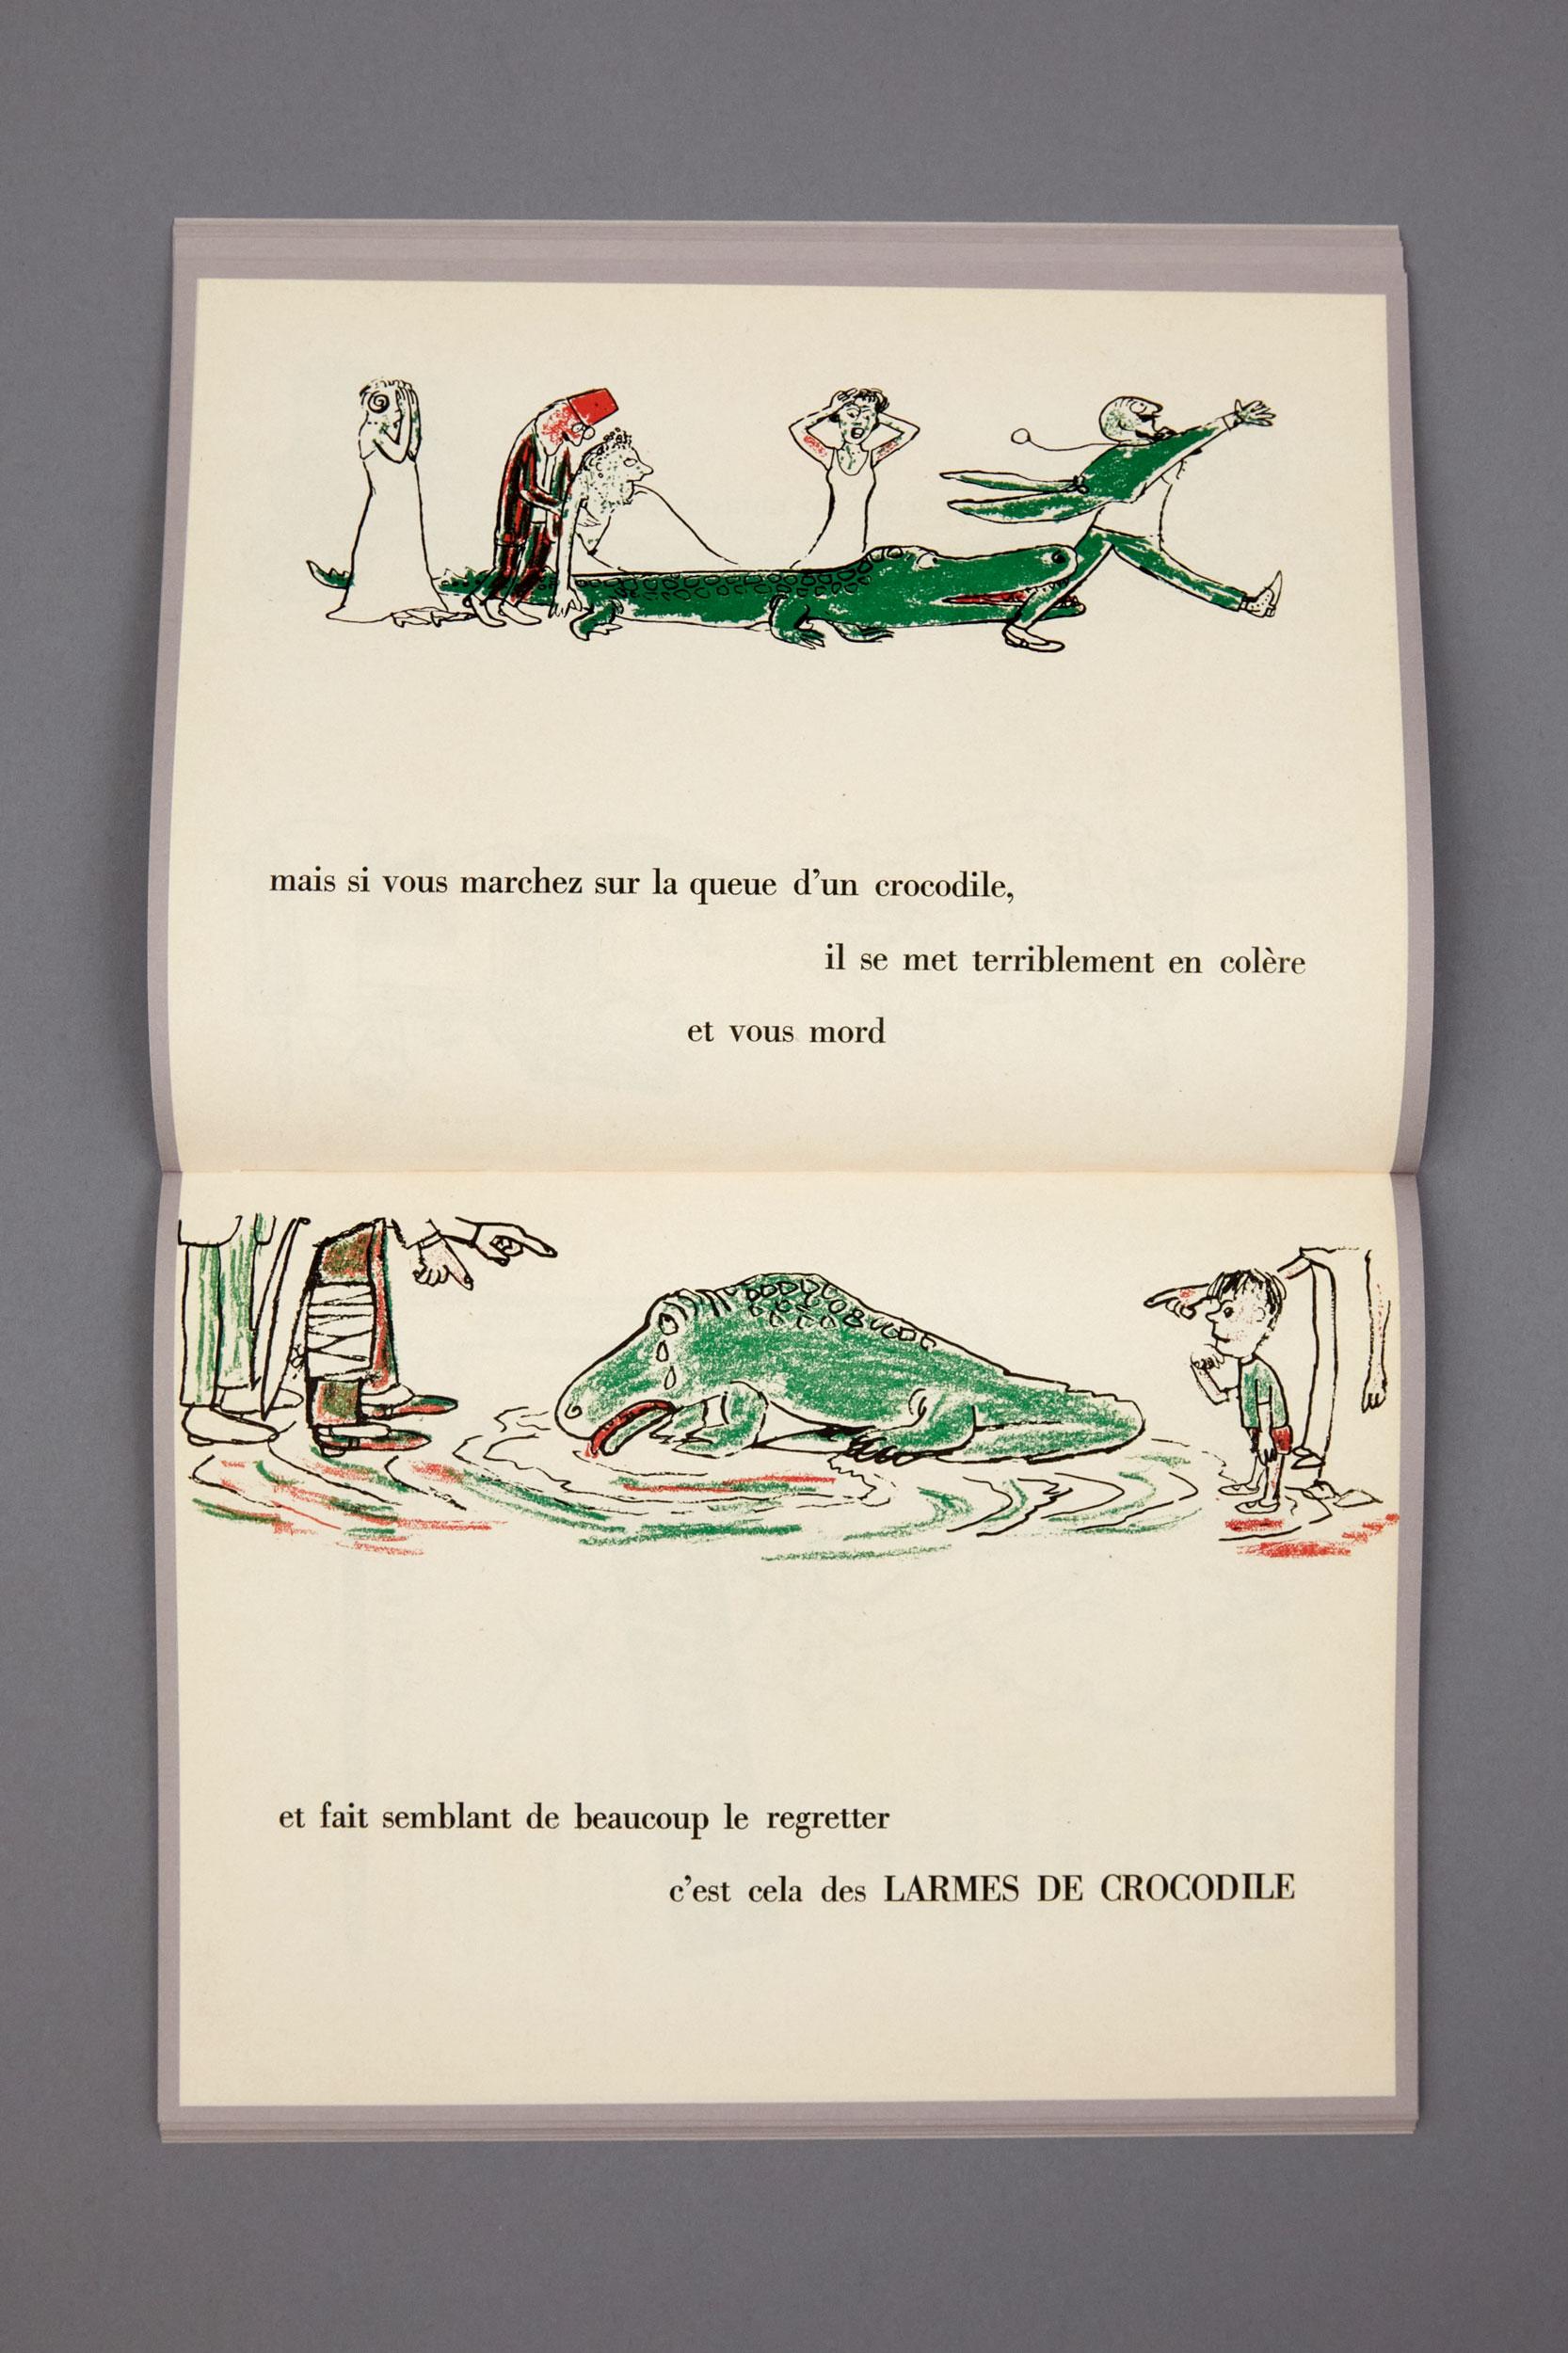 neuf-9-larmes-croco-1-delpire-andrefrancois